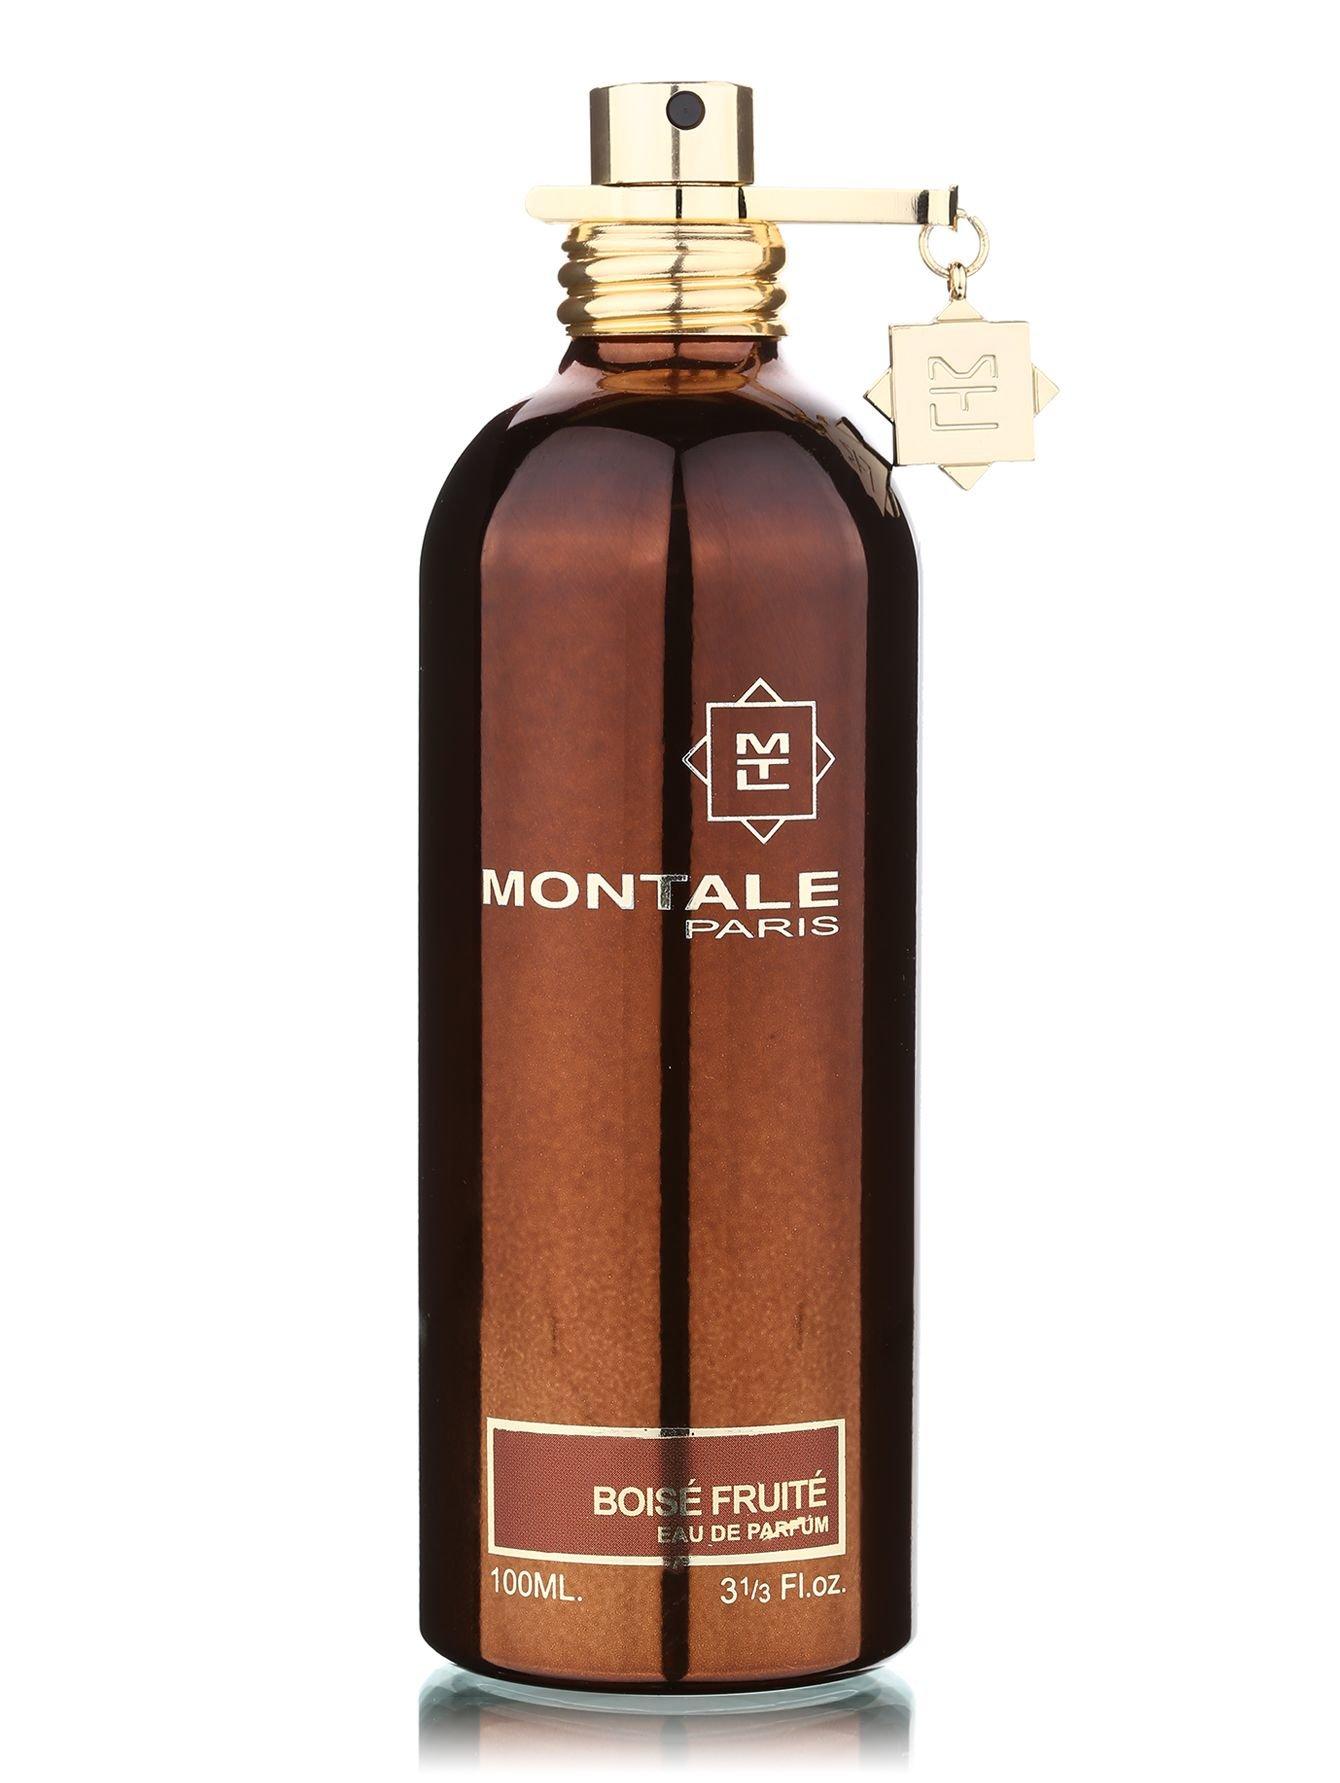 Парфюмерная вода Montale Boise Fruite 100ml montale boise fruite